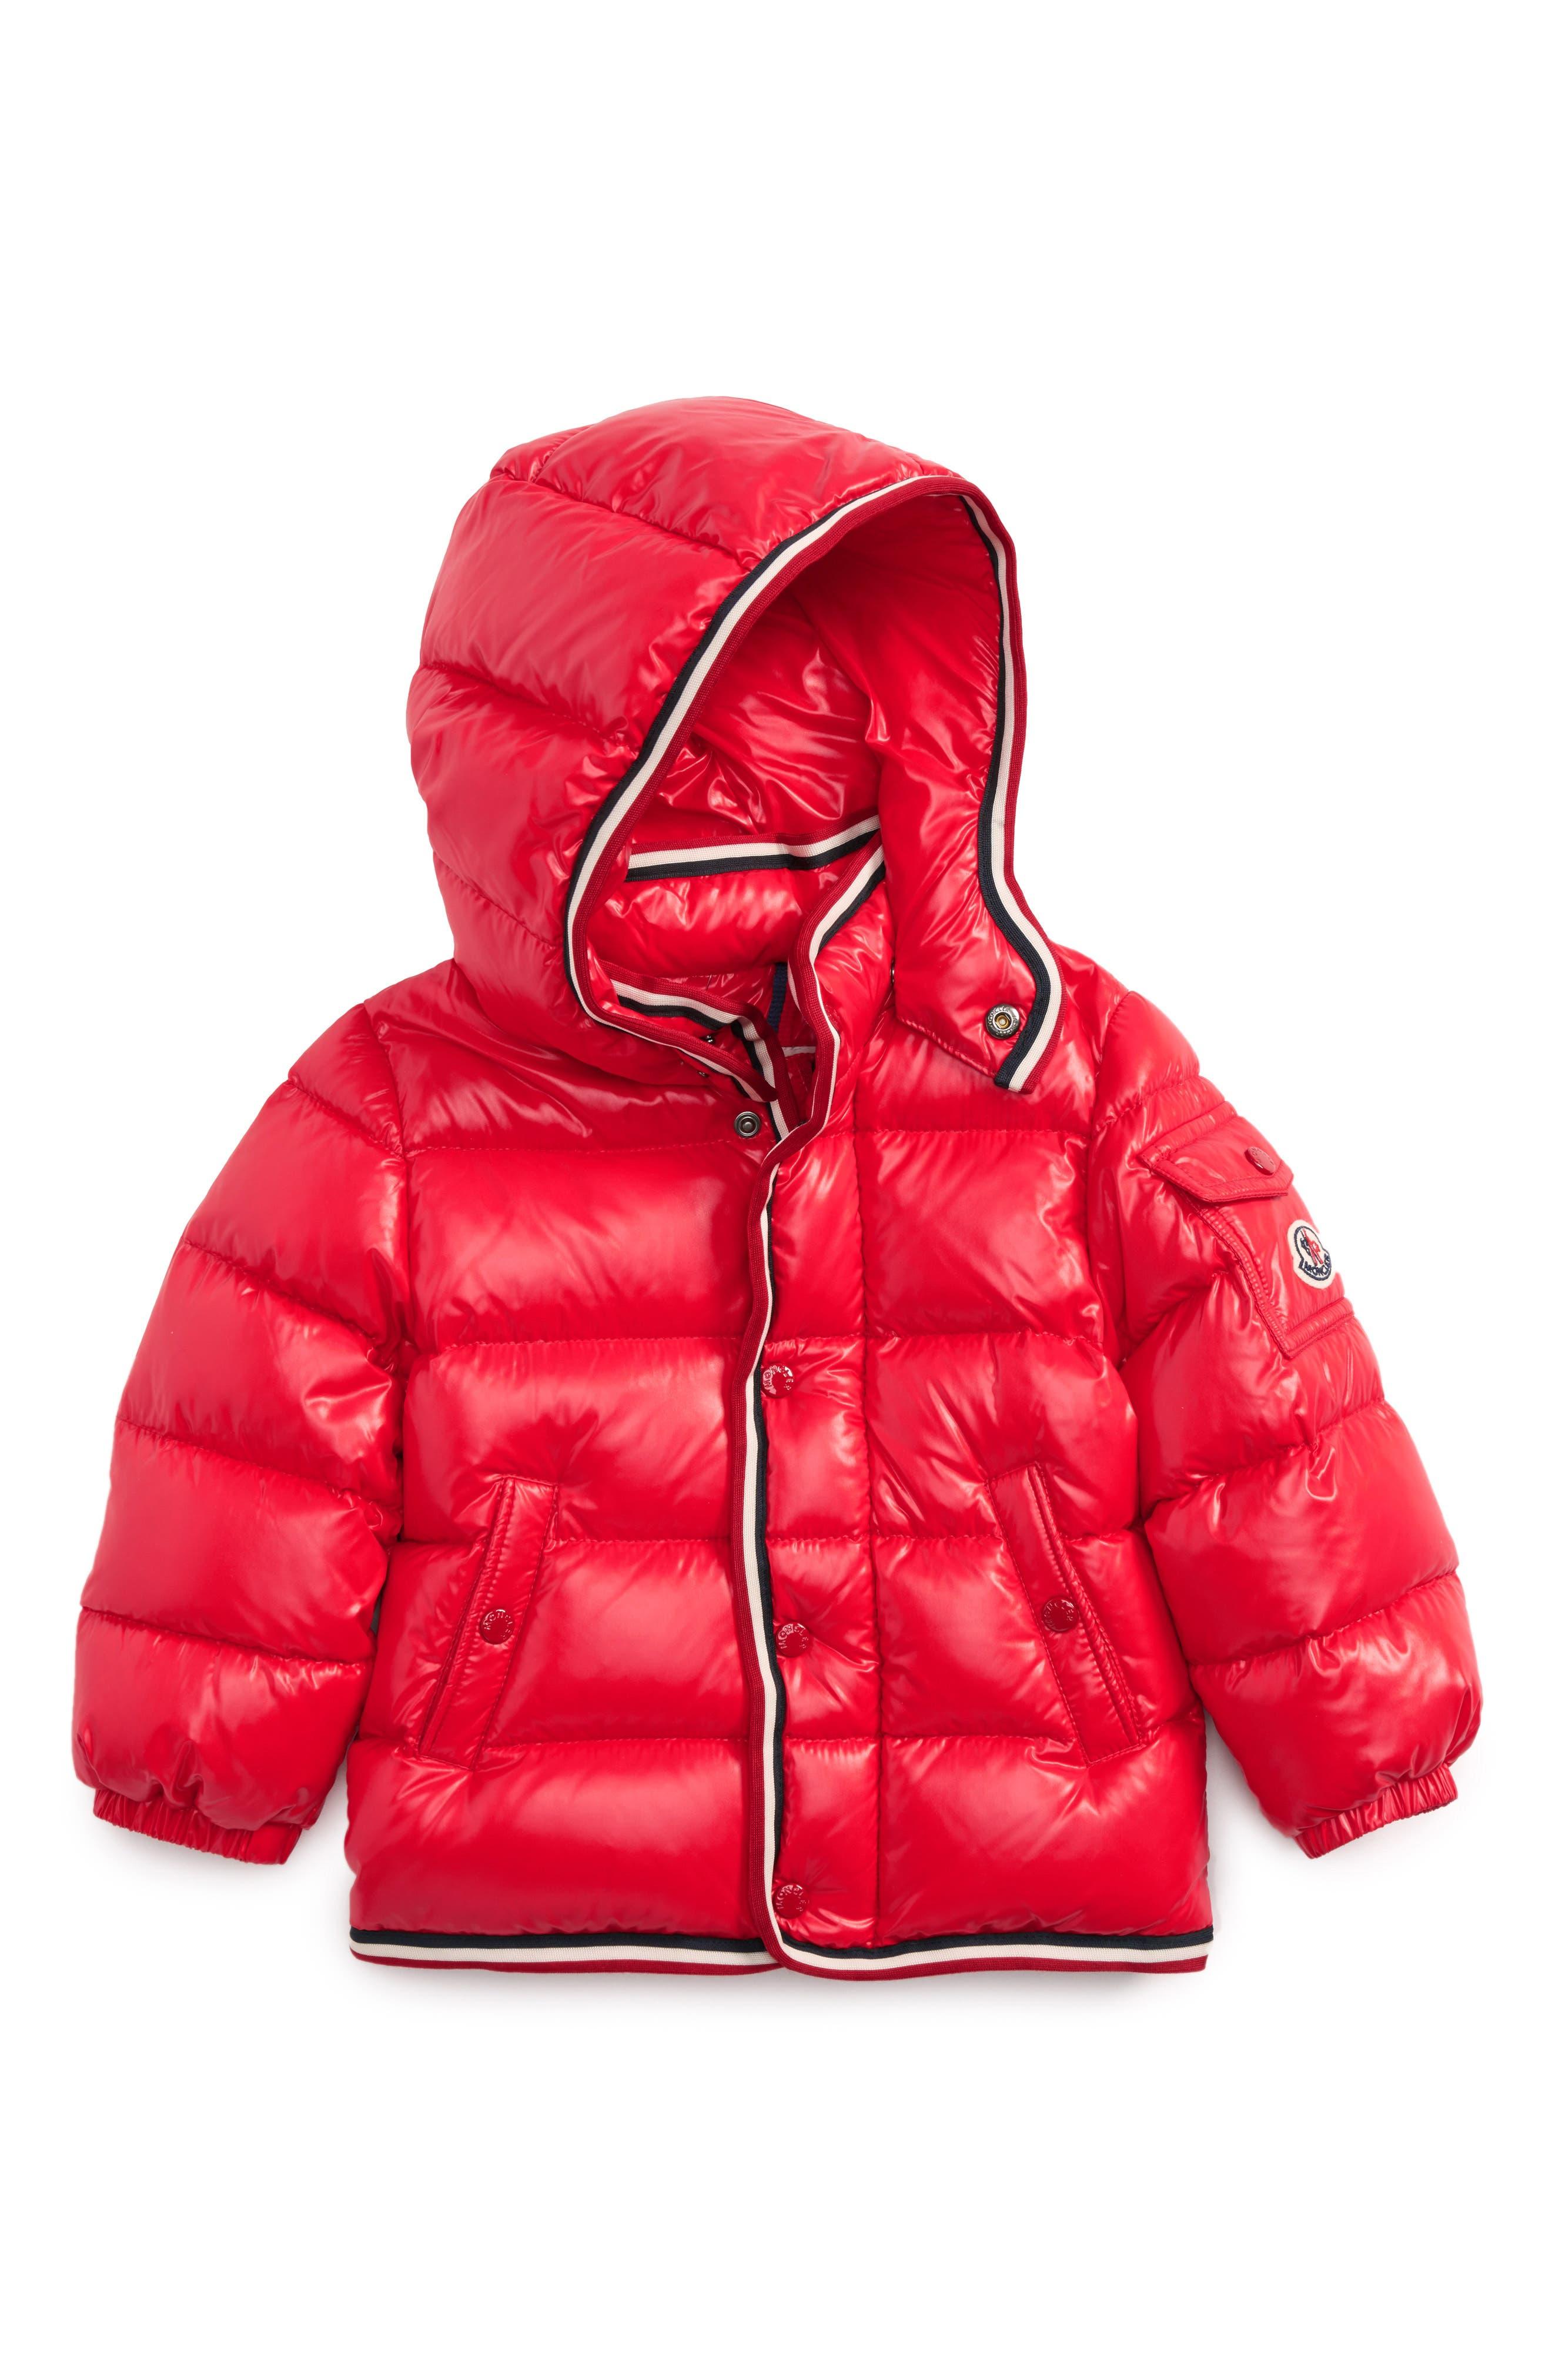 Main Image - Moncler Abelard Water Repellent Down Jacket (Baby)